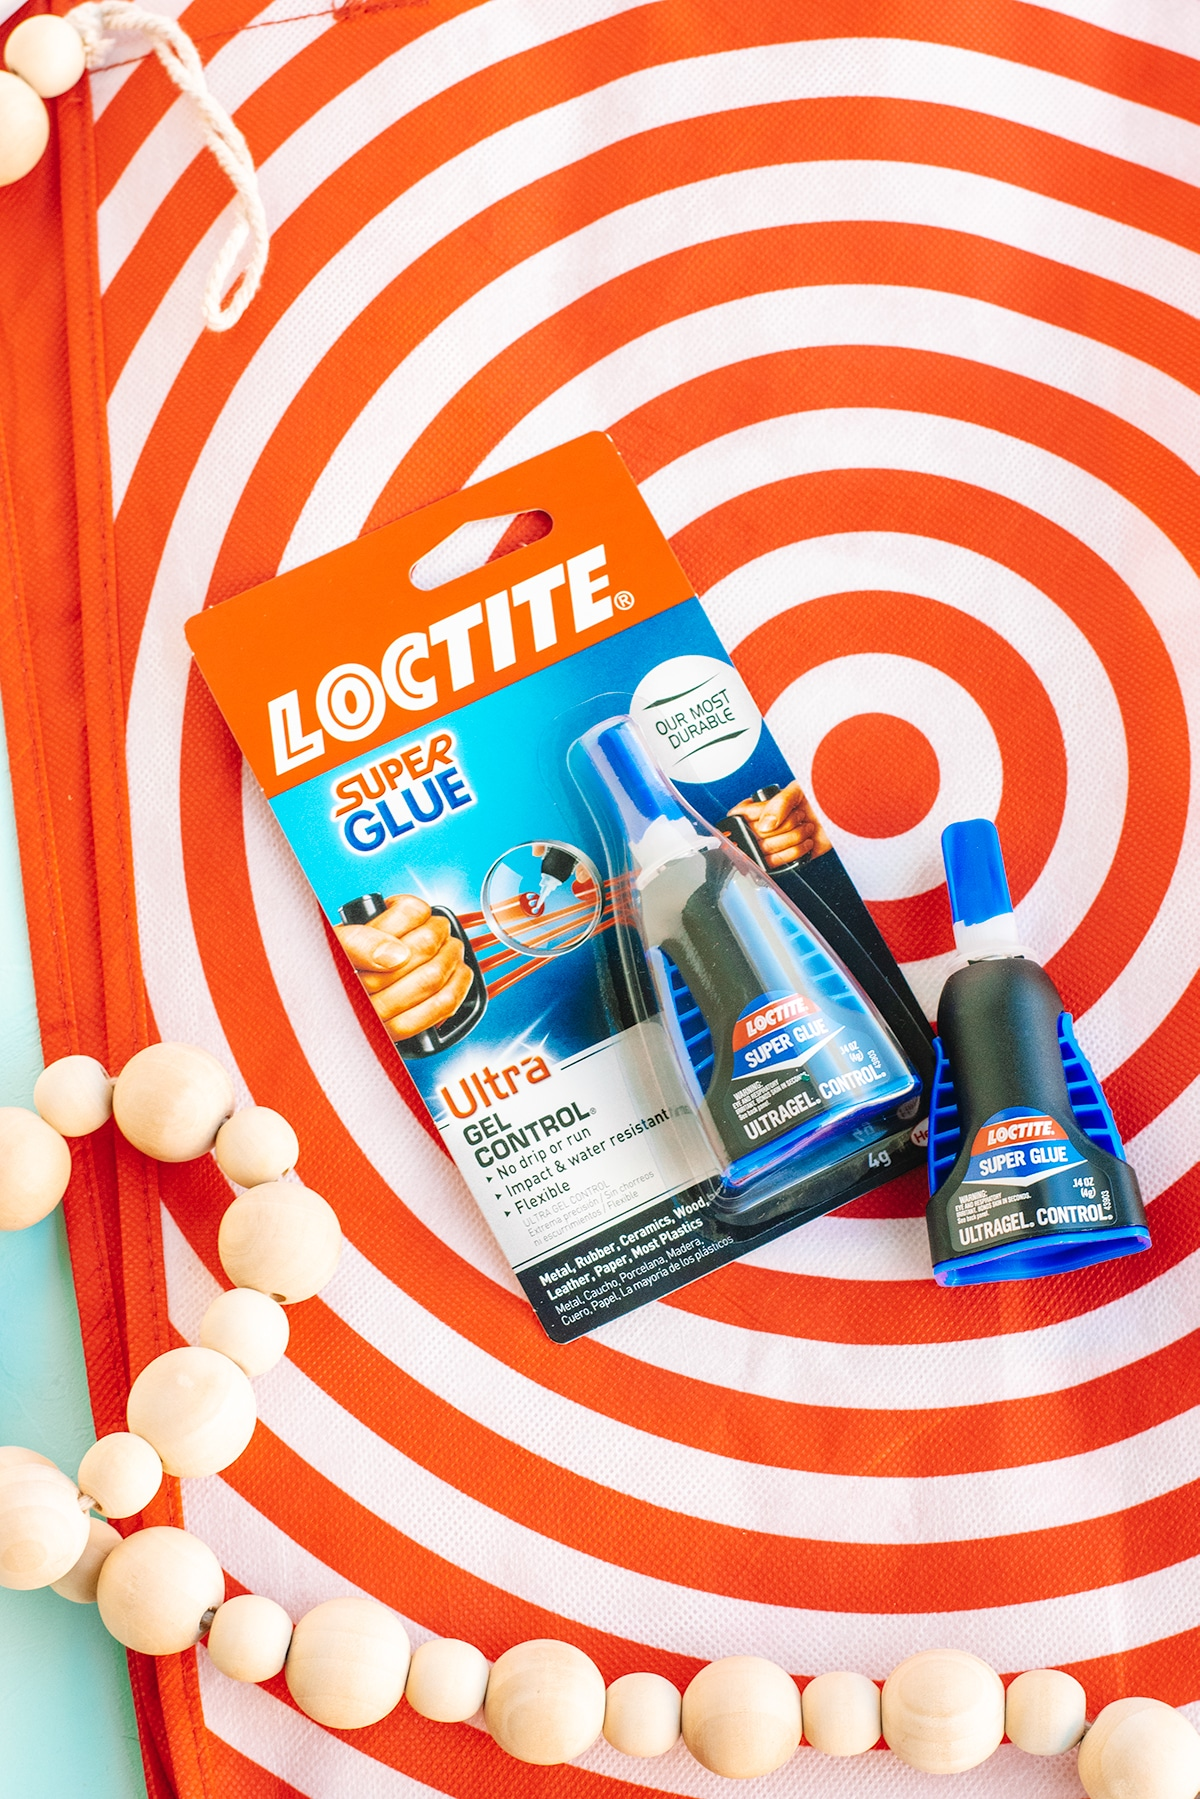 Loctite at target